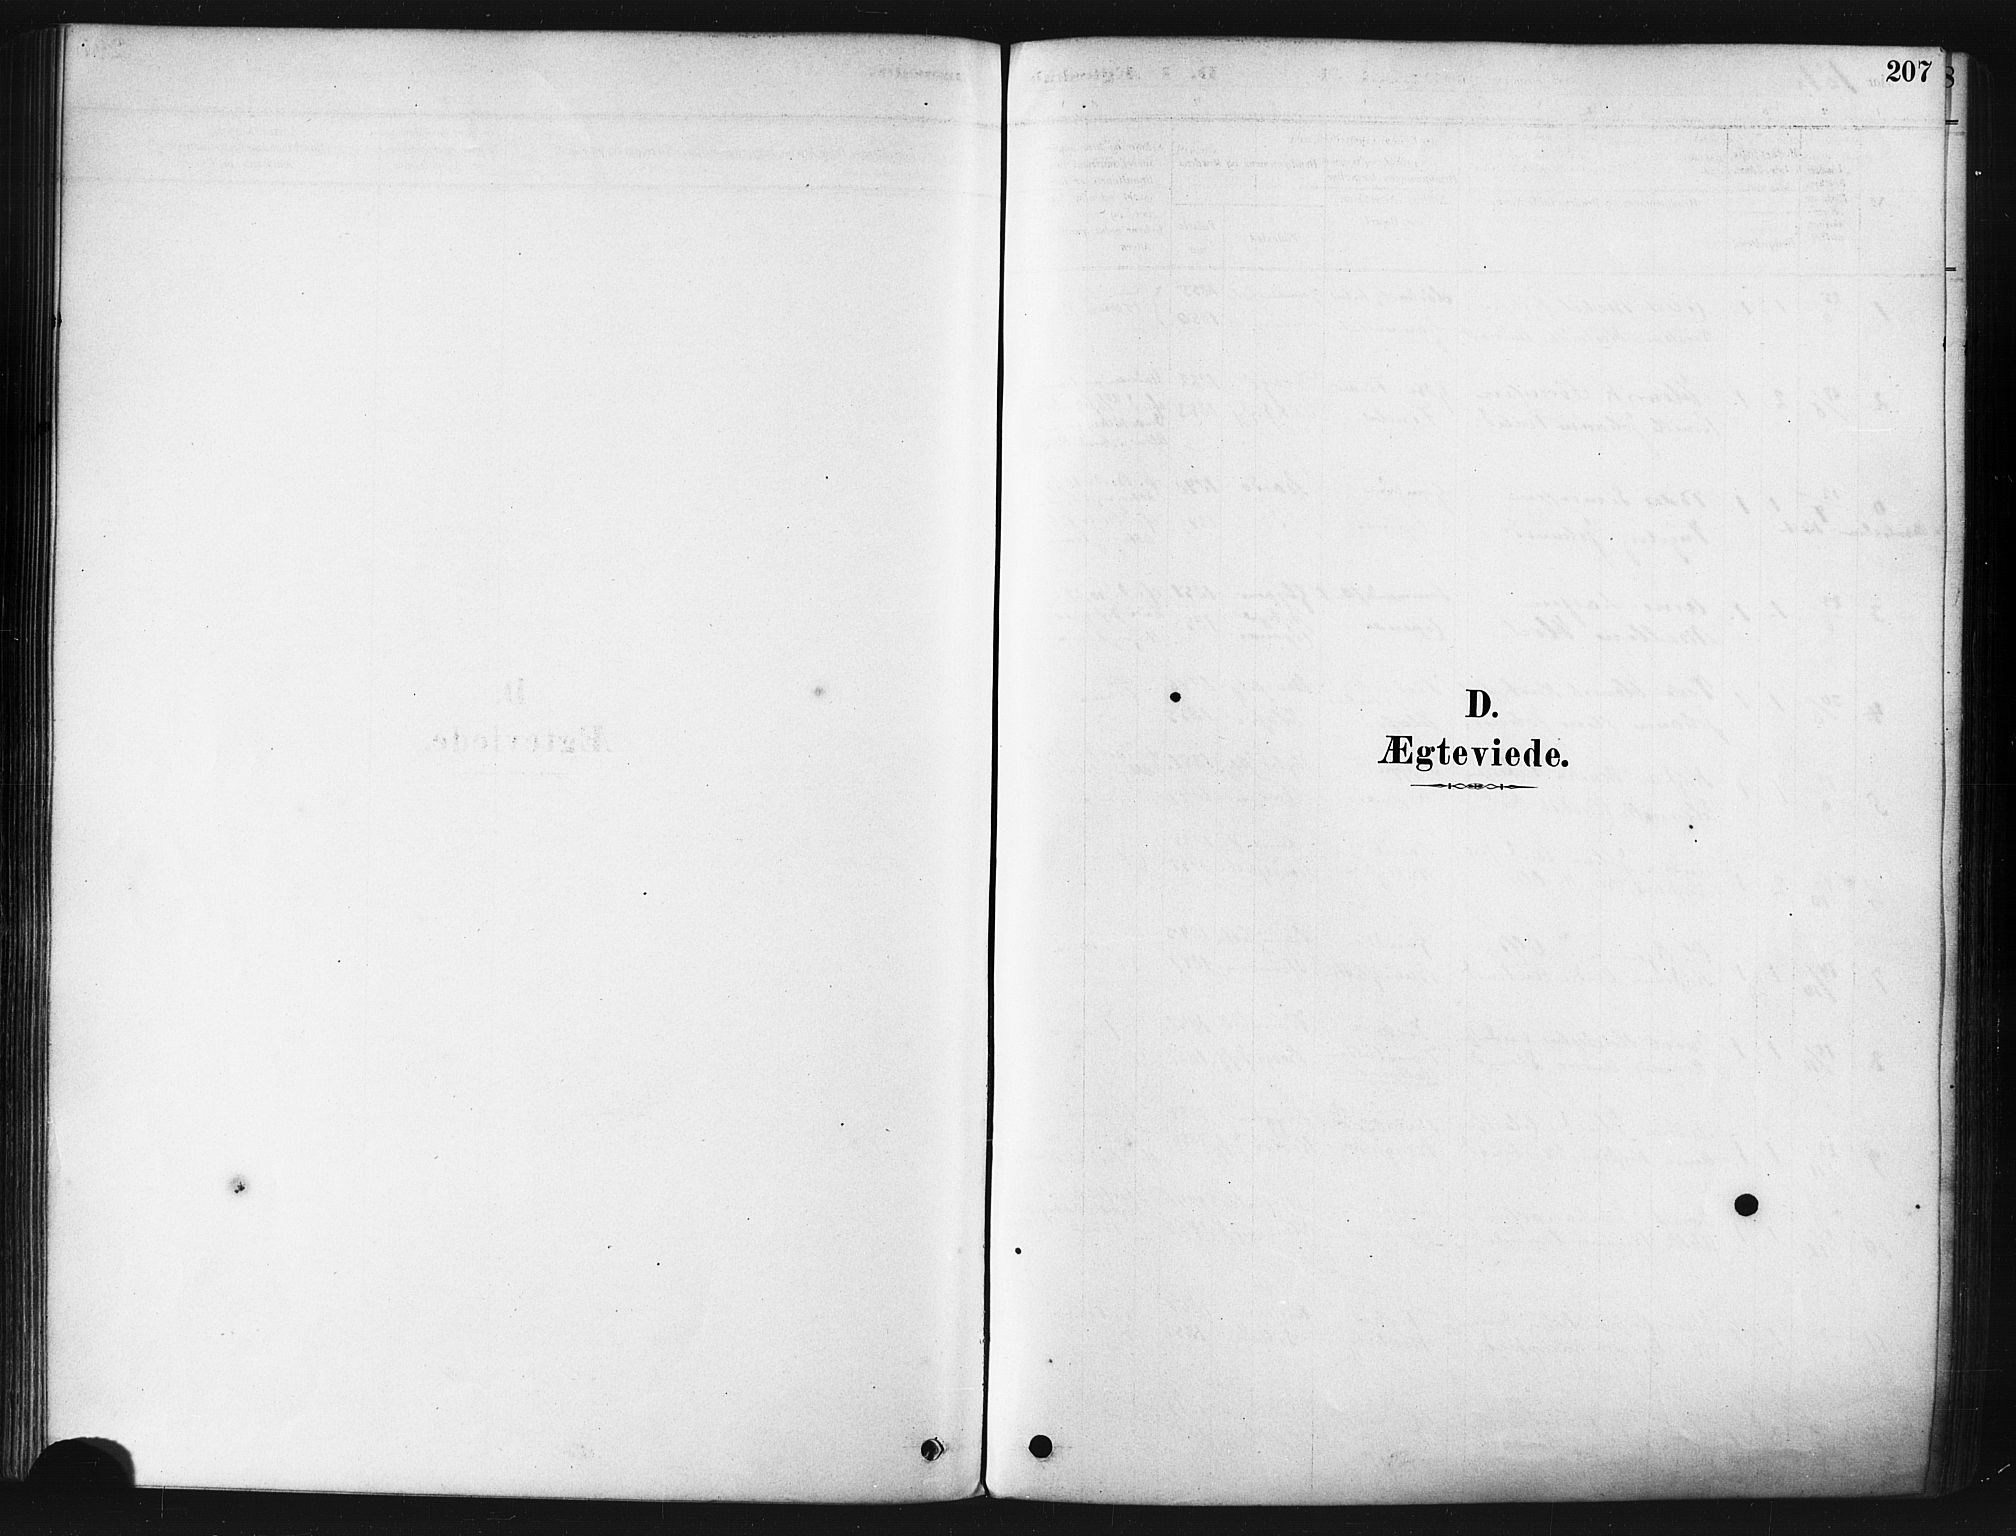 SATØ, Tranøy sokneprestkontor, I/Ia/Iaa/L0009kirke: Ministerialbok nr. 9, 1878-1904, s. 207